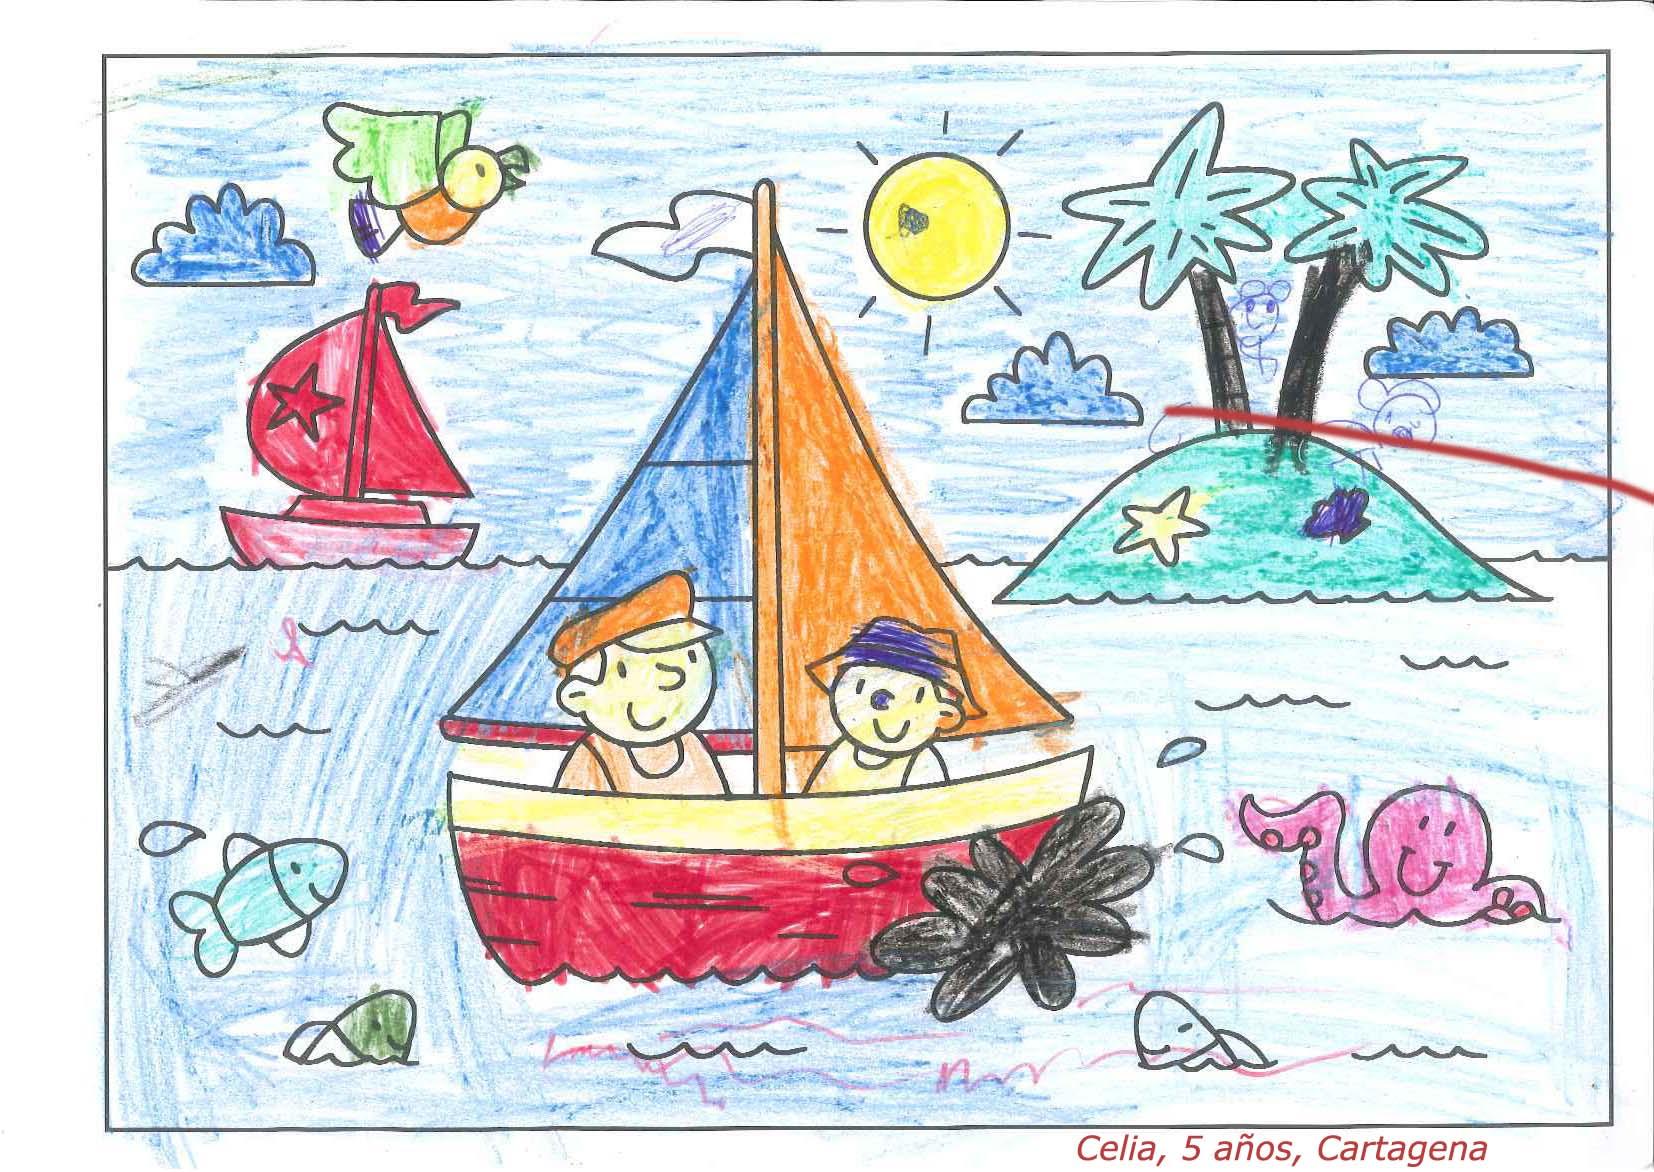 Infantil | Blog Cátedra de Historia y Patrimonio Naval